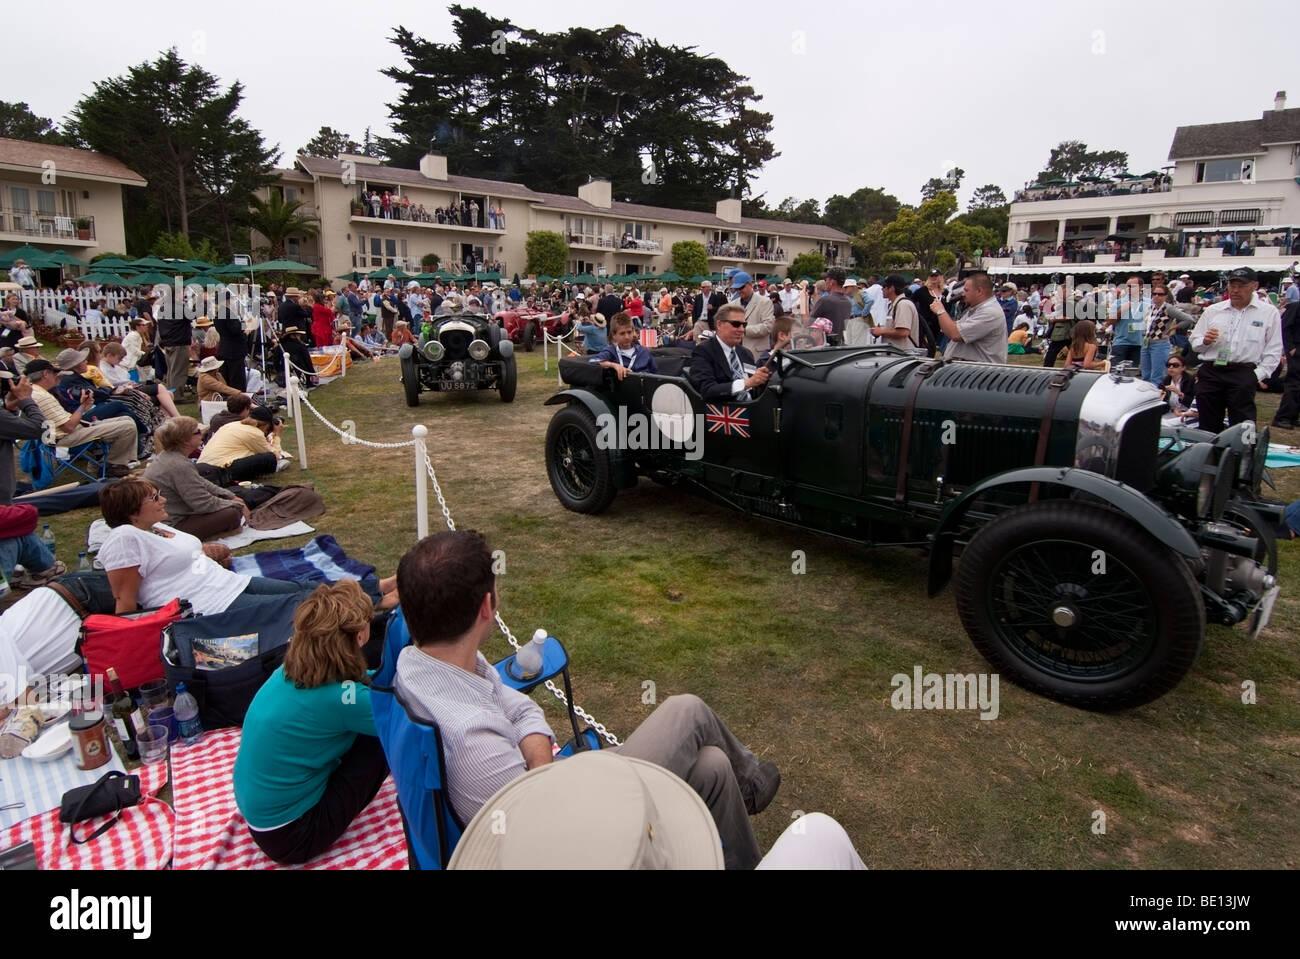 Oldtimer Bentley Automobile durchfahren des Publikums während der 2009 Pebble Beach Concours d ' Elegance Stockbild